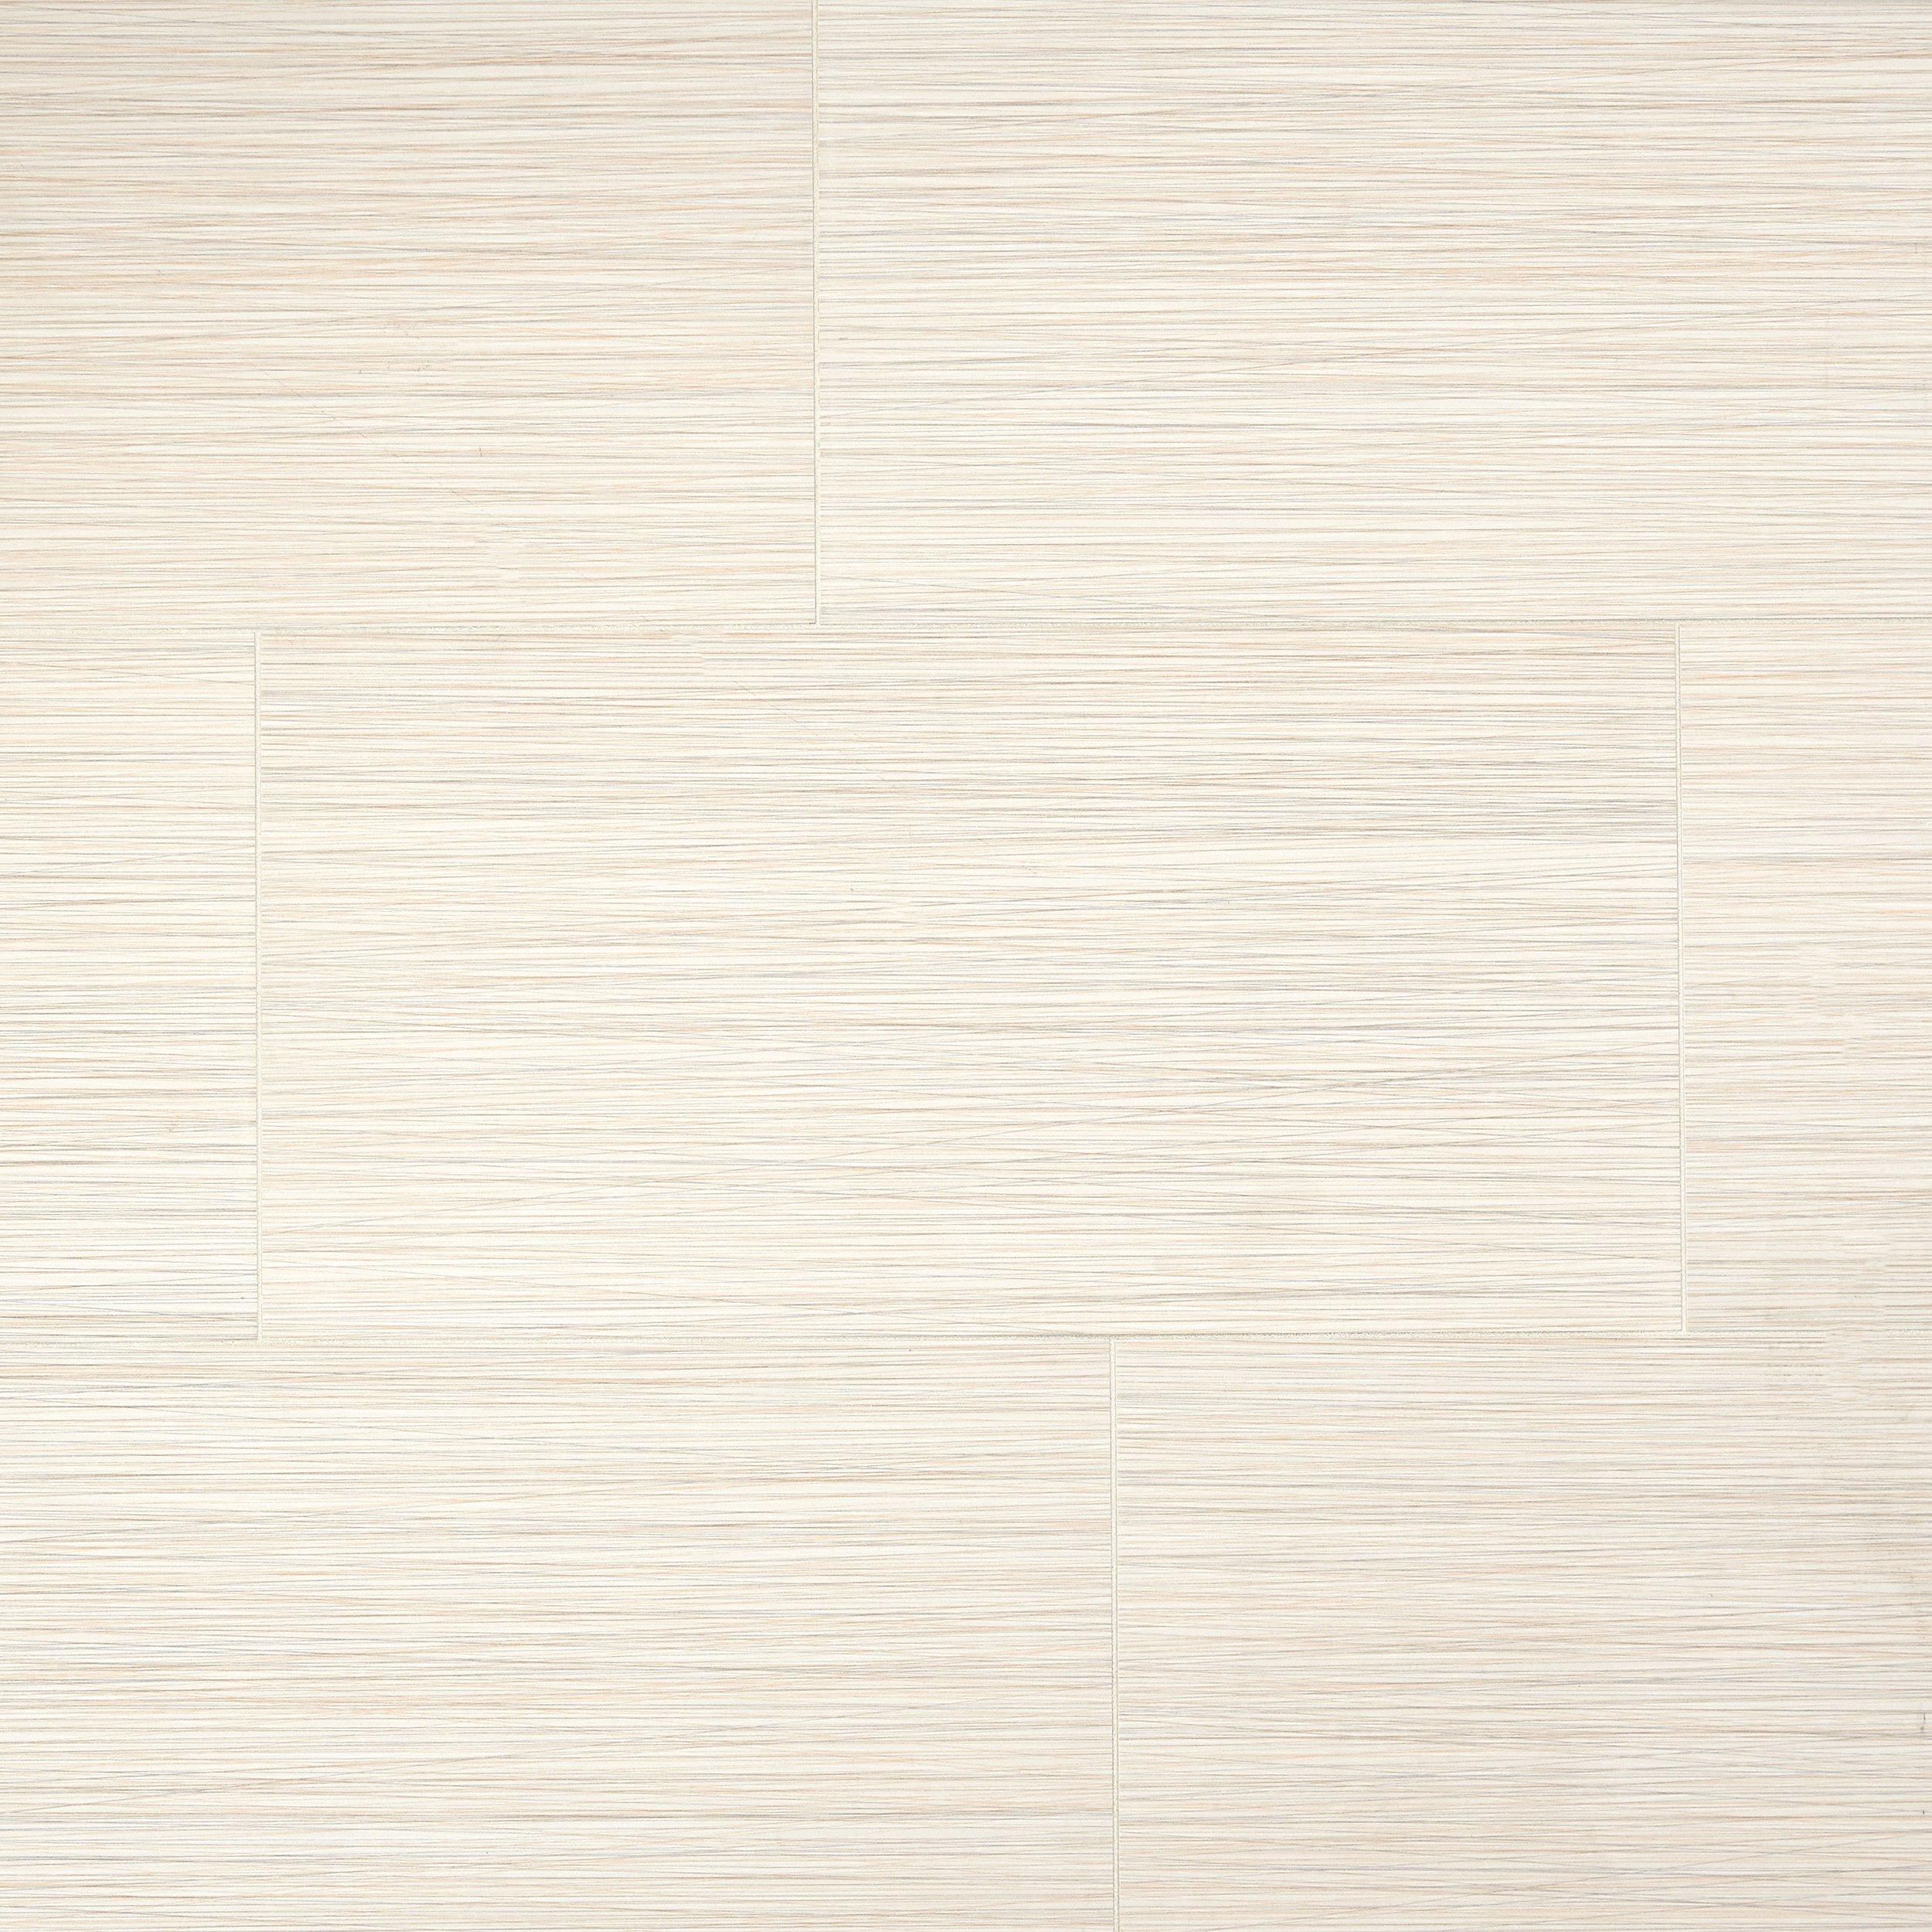 Ceramic tile tessuto linen beige white body ceramic tile 12in x 24in dailygadgetfo Image collections